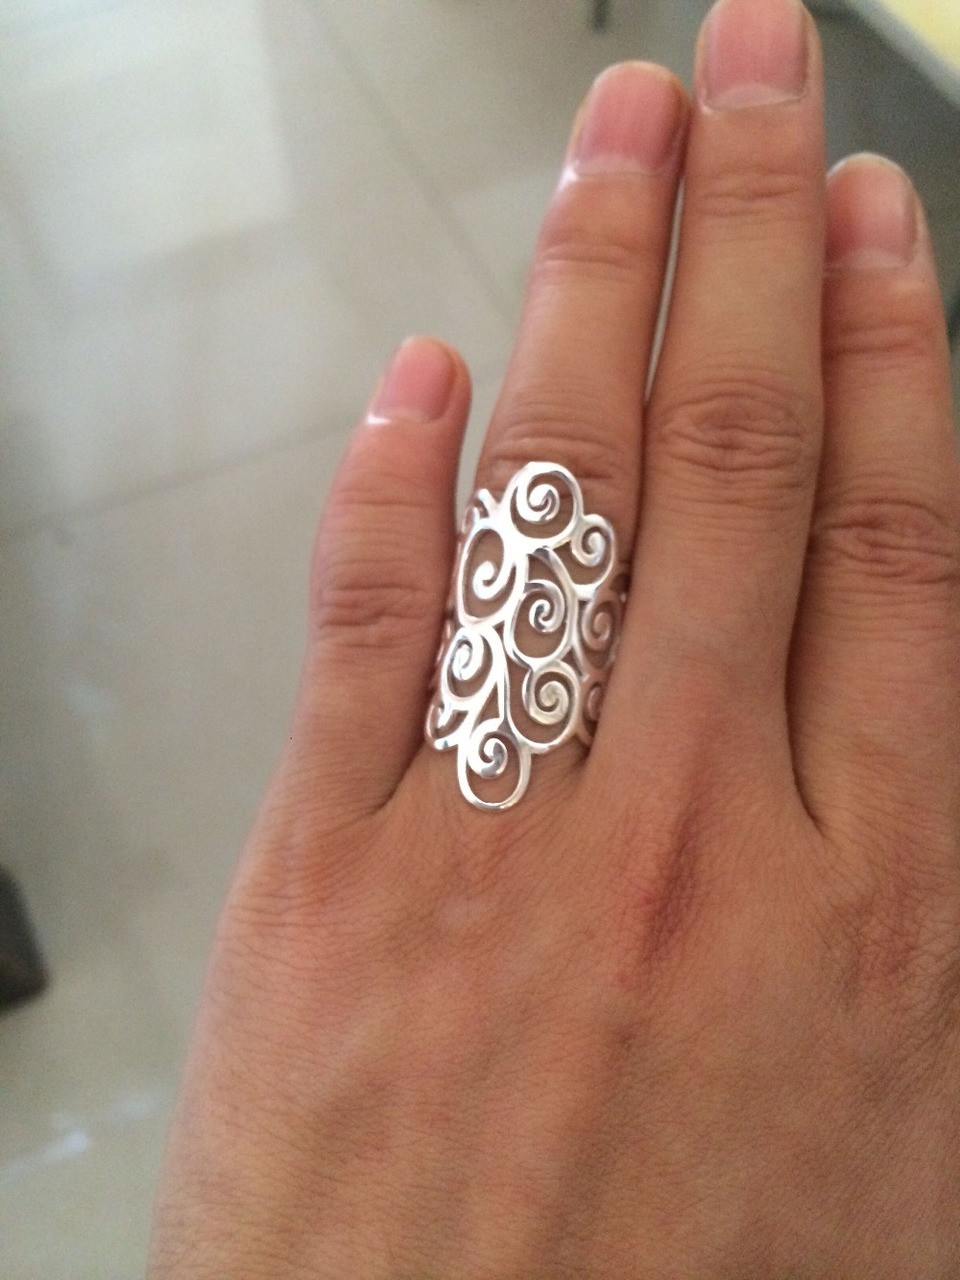 0fbd2b38b ... Retro 925 Sterling Silver Spiral Filigree Swirl Polish Finished Band  Long Ring thumb Adjustable jewelry Women ...